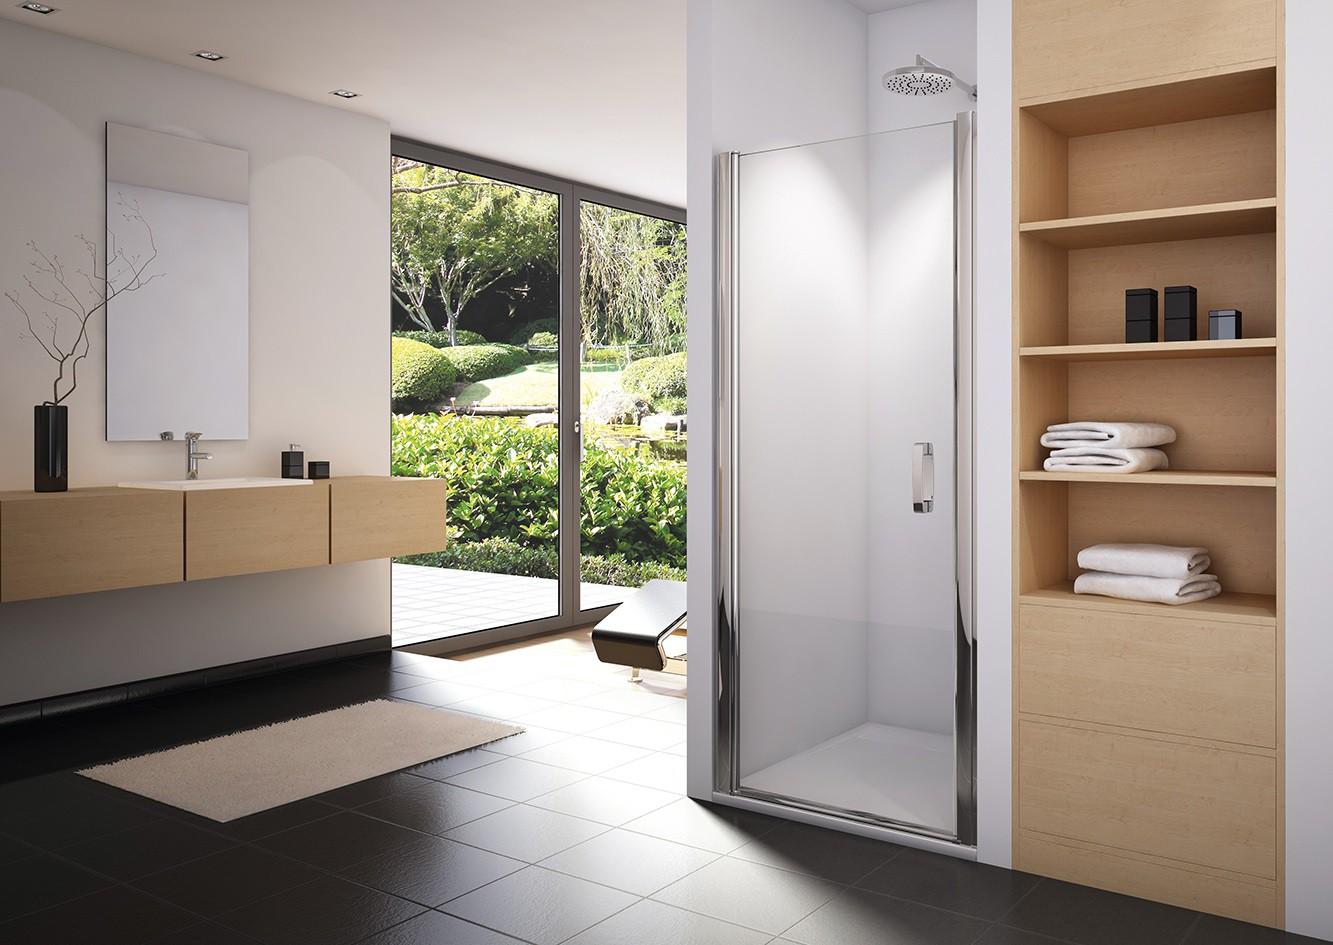 duscht r pendelt r nischent r ma anfertigung h he 150 bis 195 cm. Black Bedroom Furniture Sets. Home Design Ideas